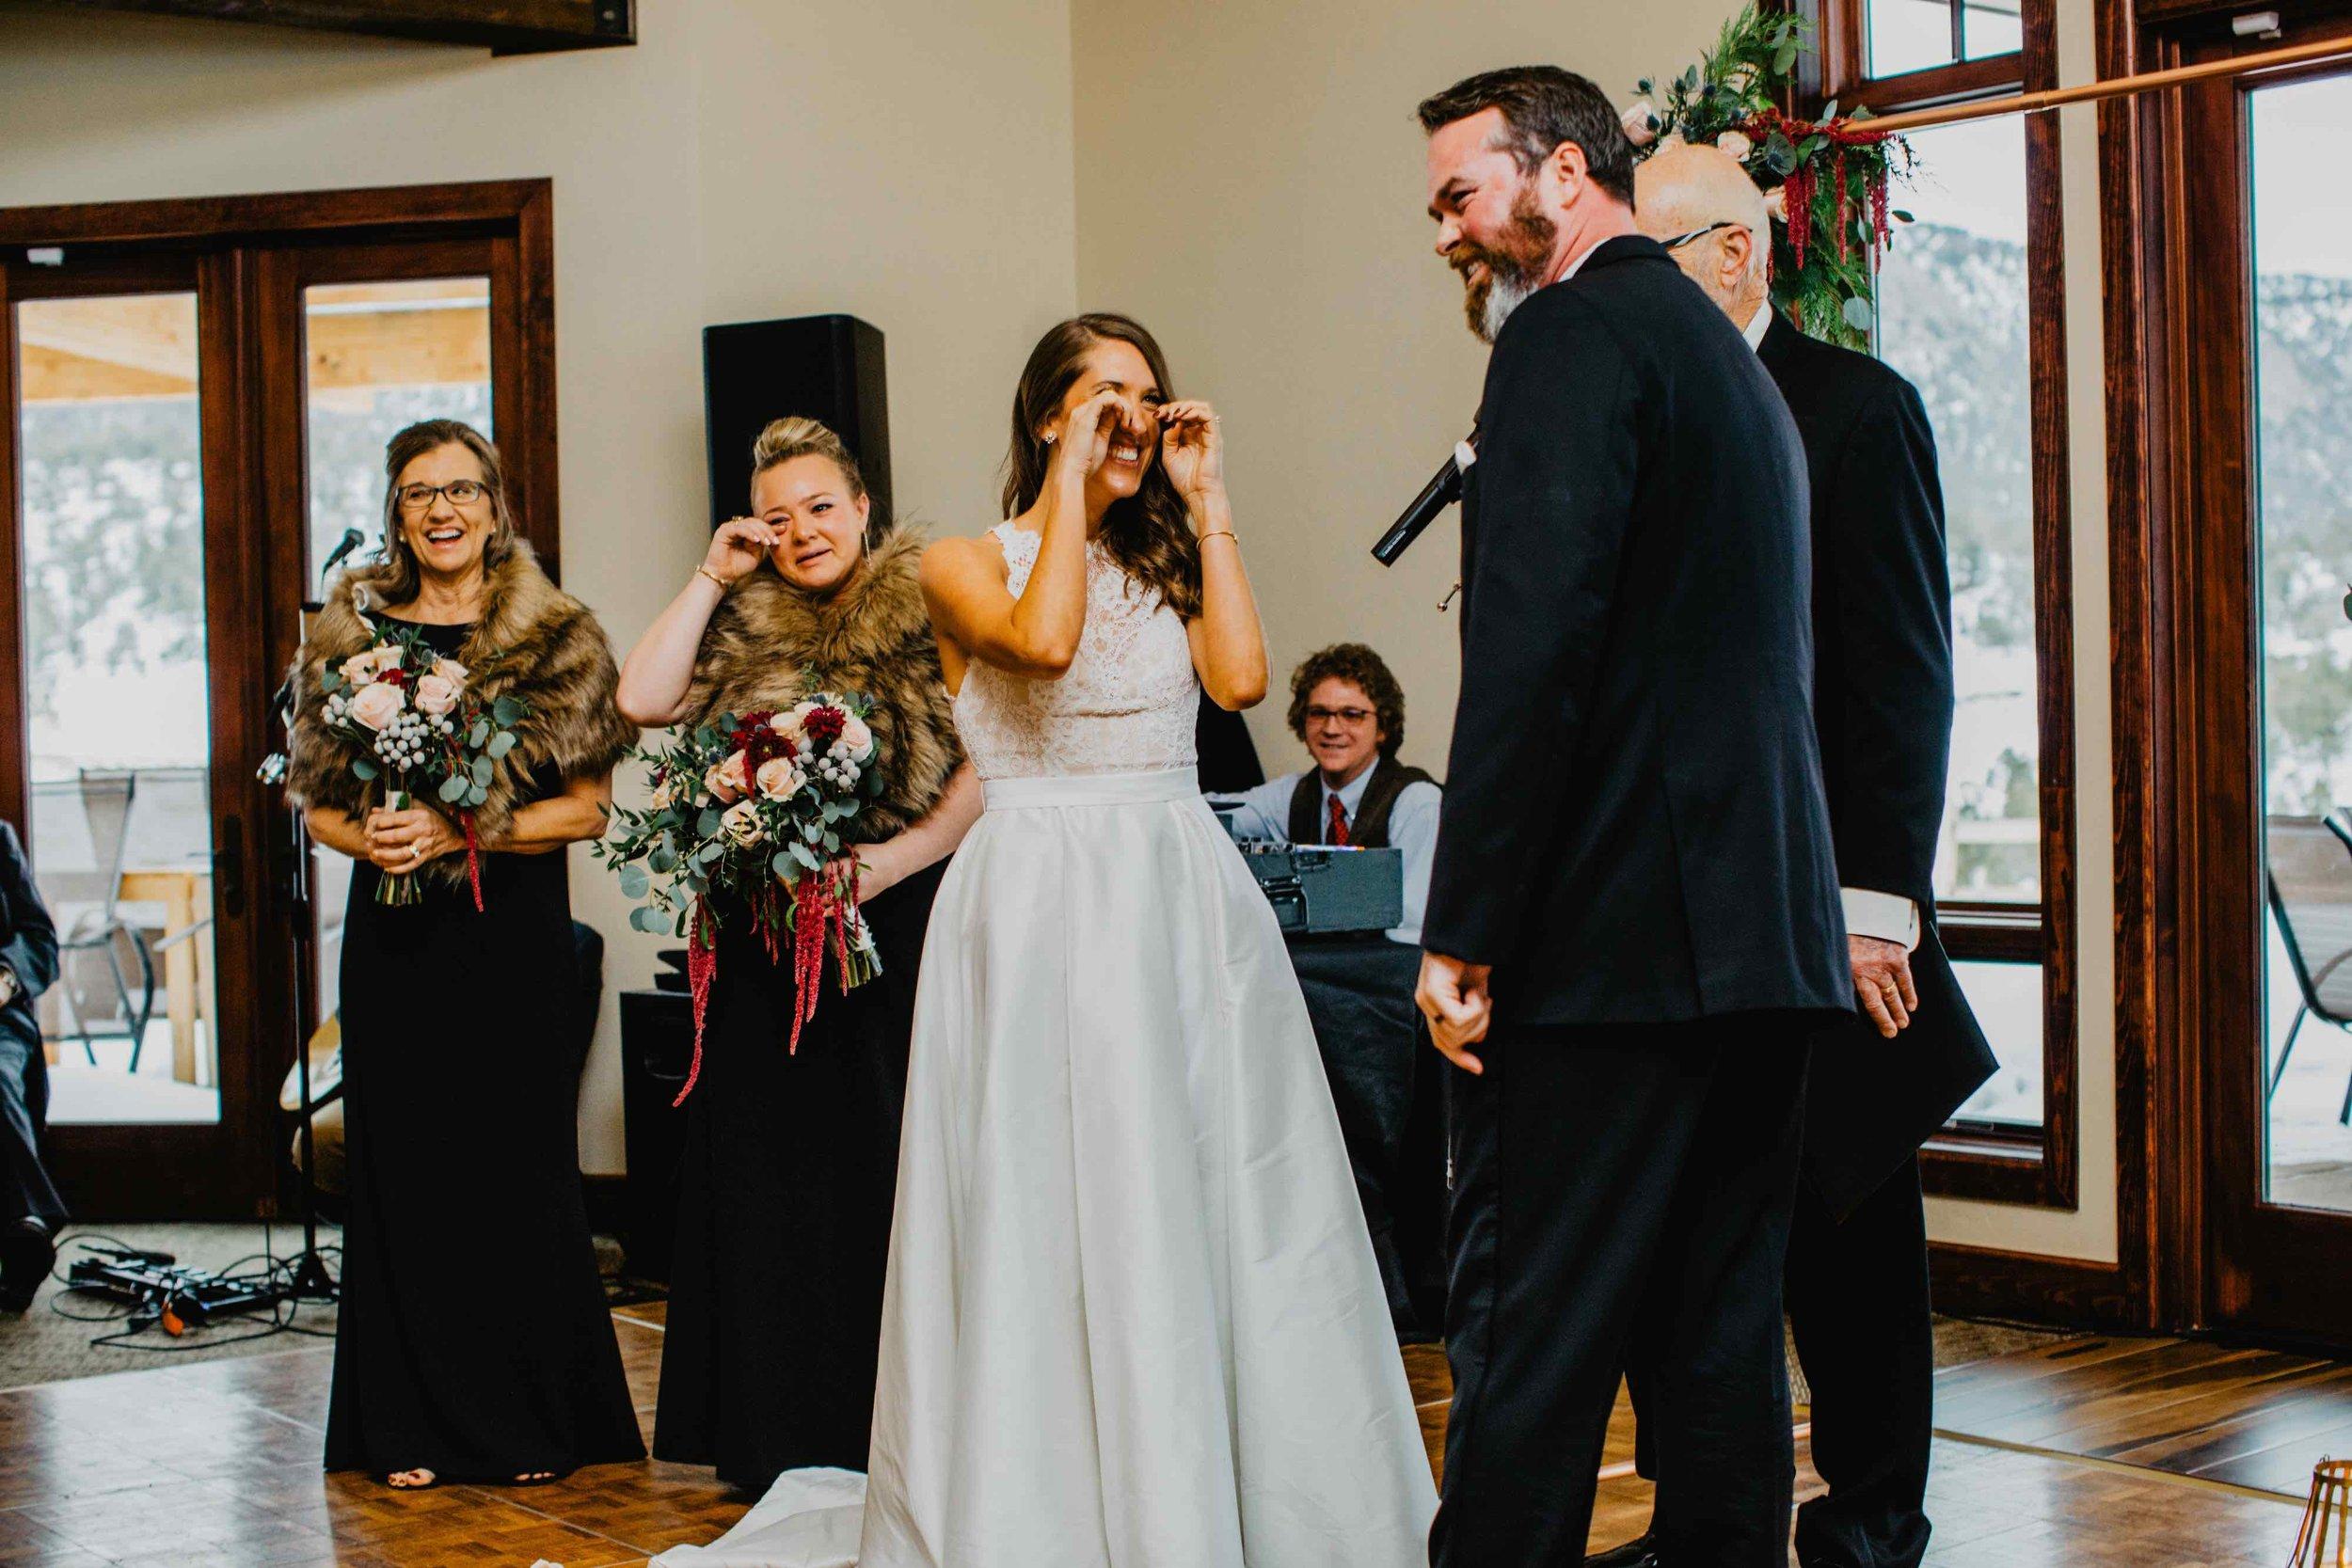 Kisa Conrad Favorites-0009-colorado-wedding-photographer-denver-springs-vailhotel-glenwood-springs-colorado-wedding-photographer.jpeg